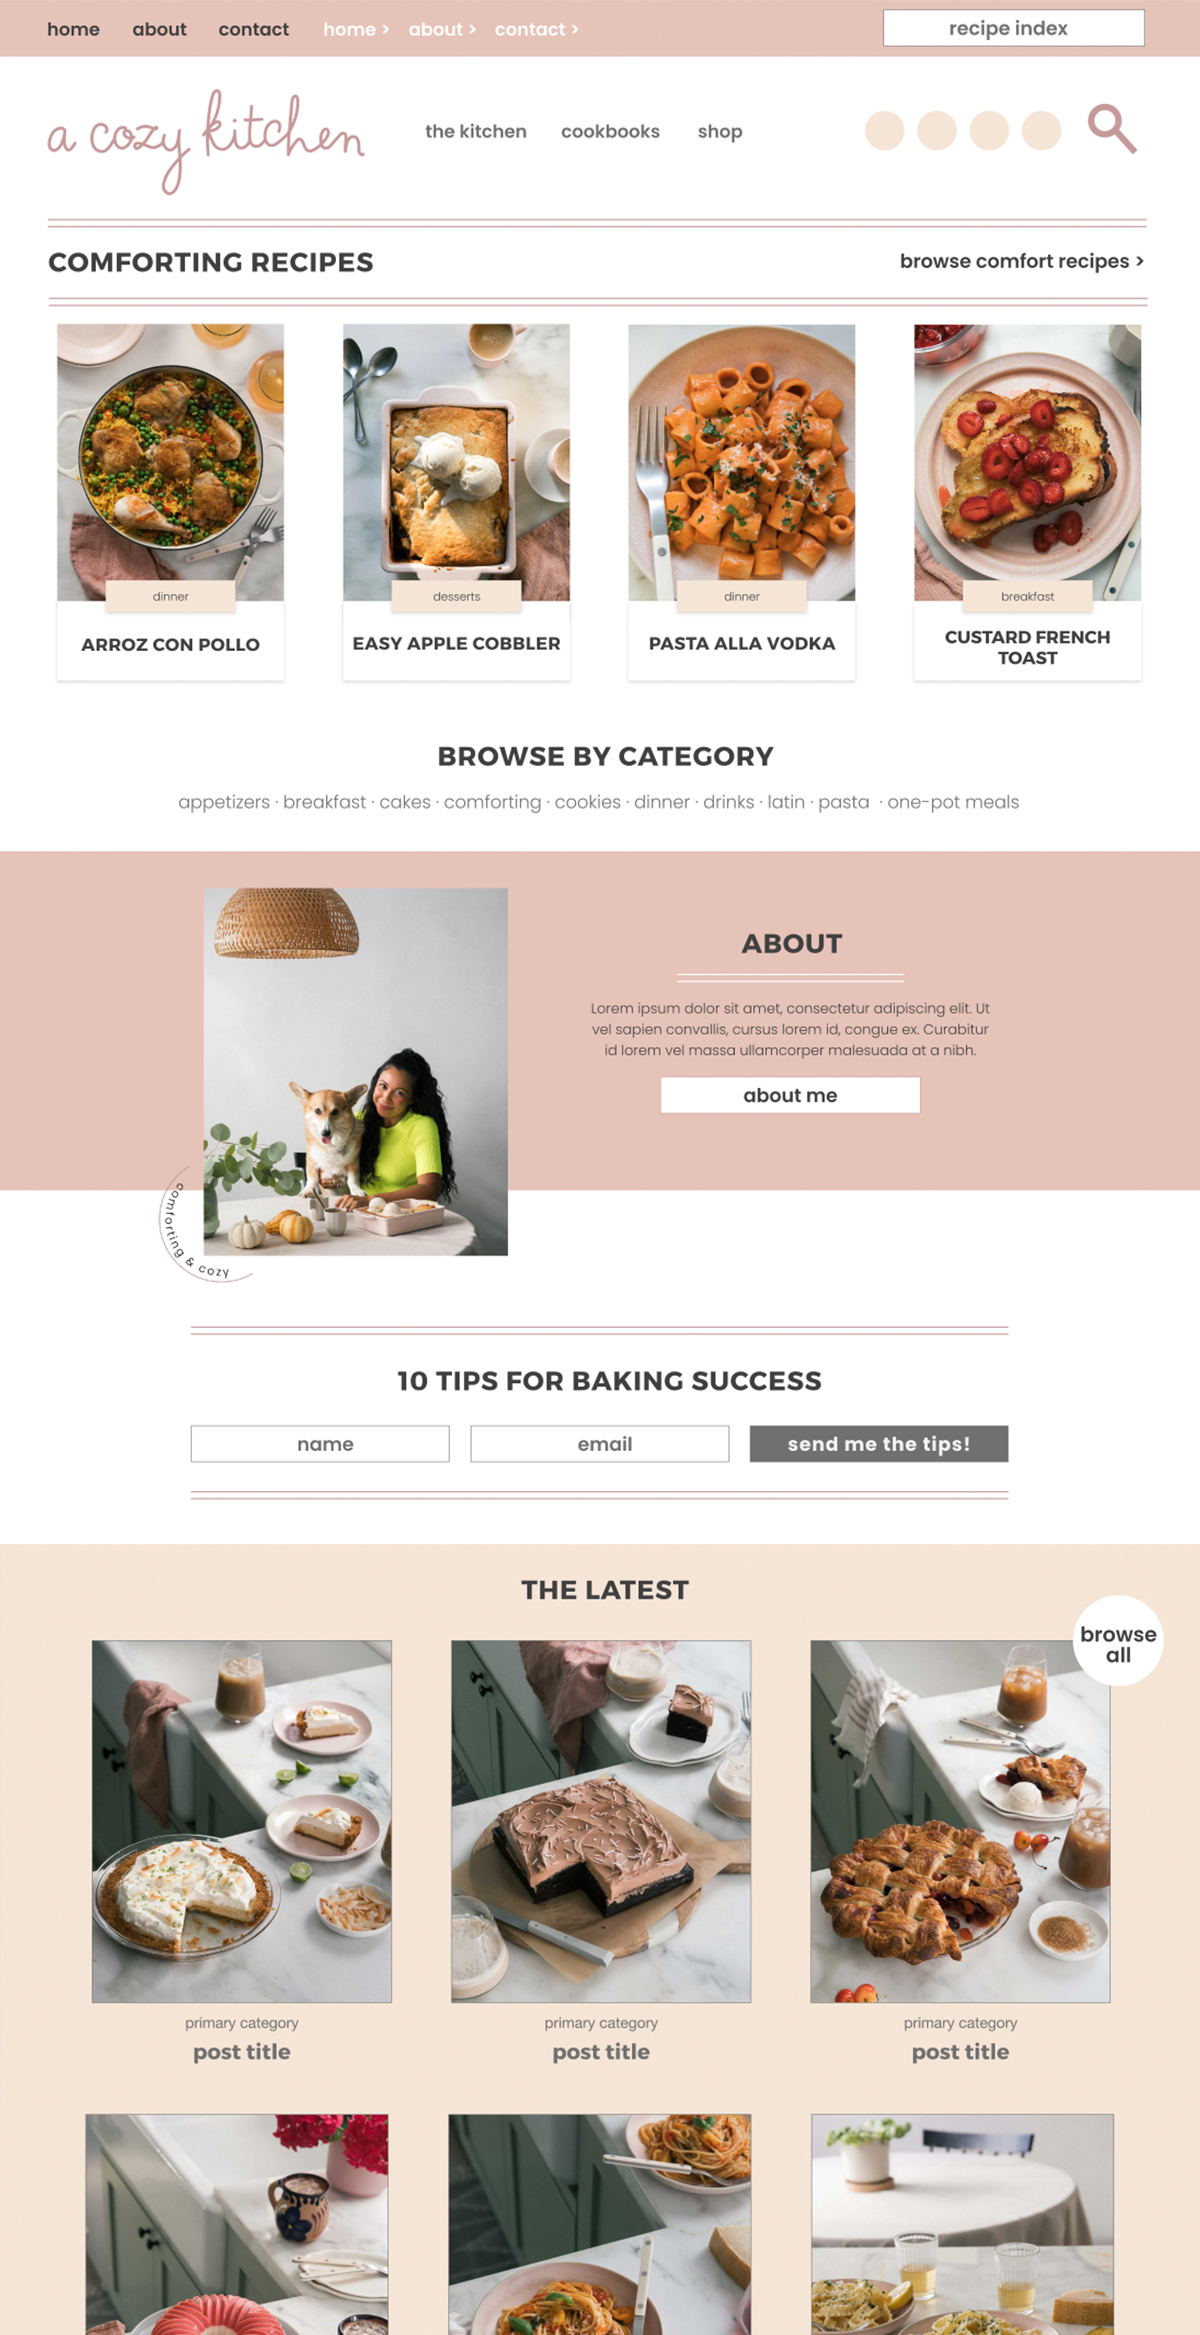 a-cozy-kitchen-web-design-food-blog